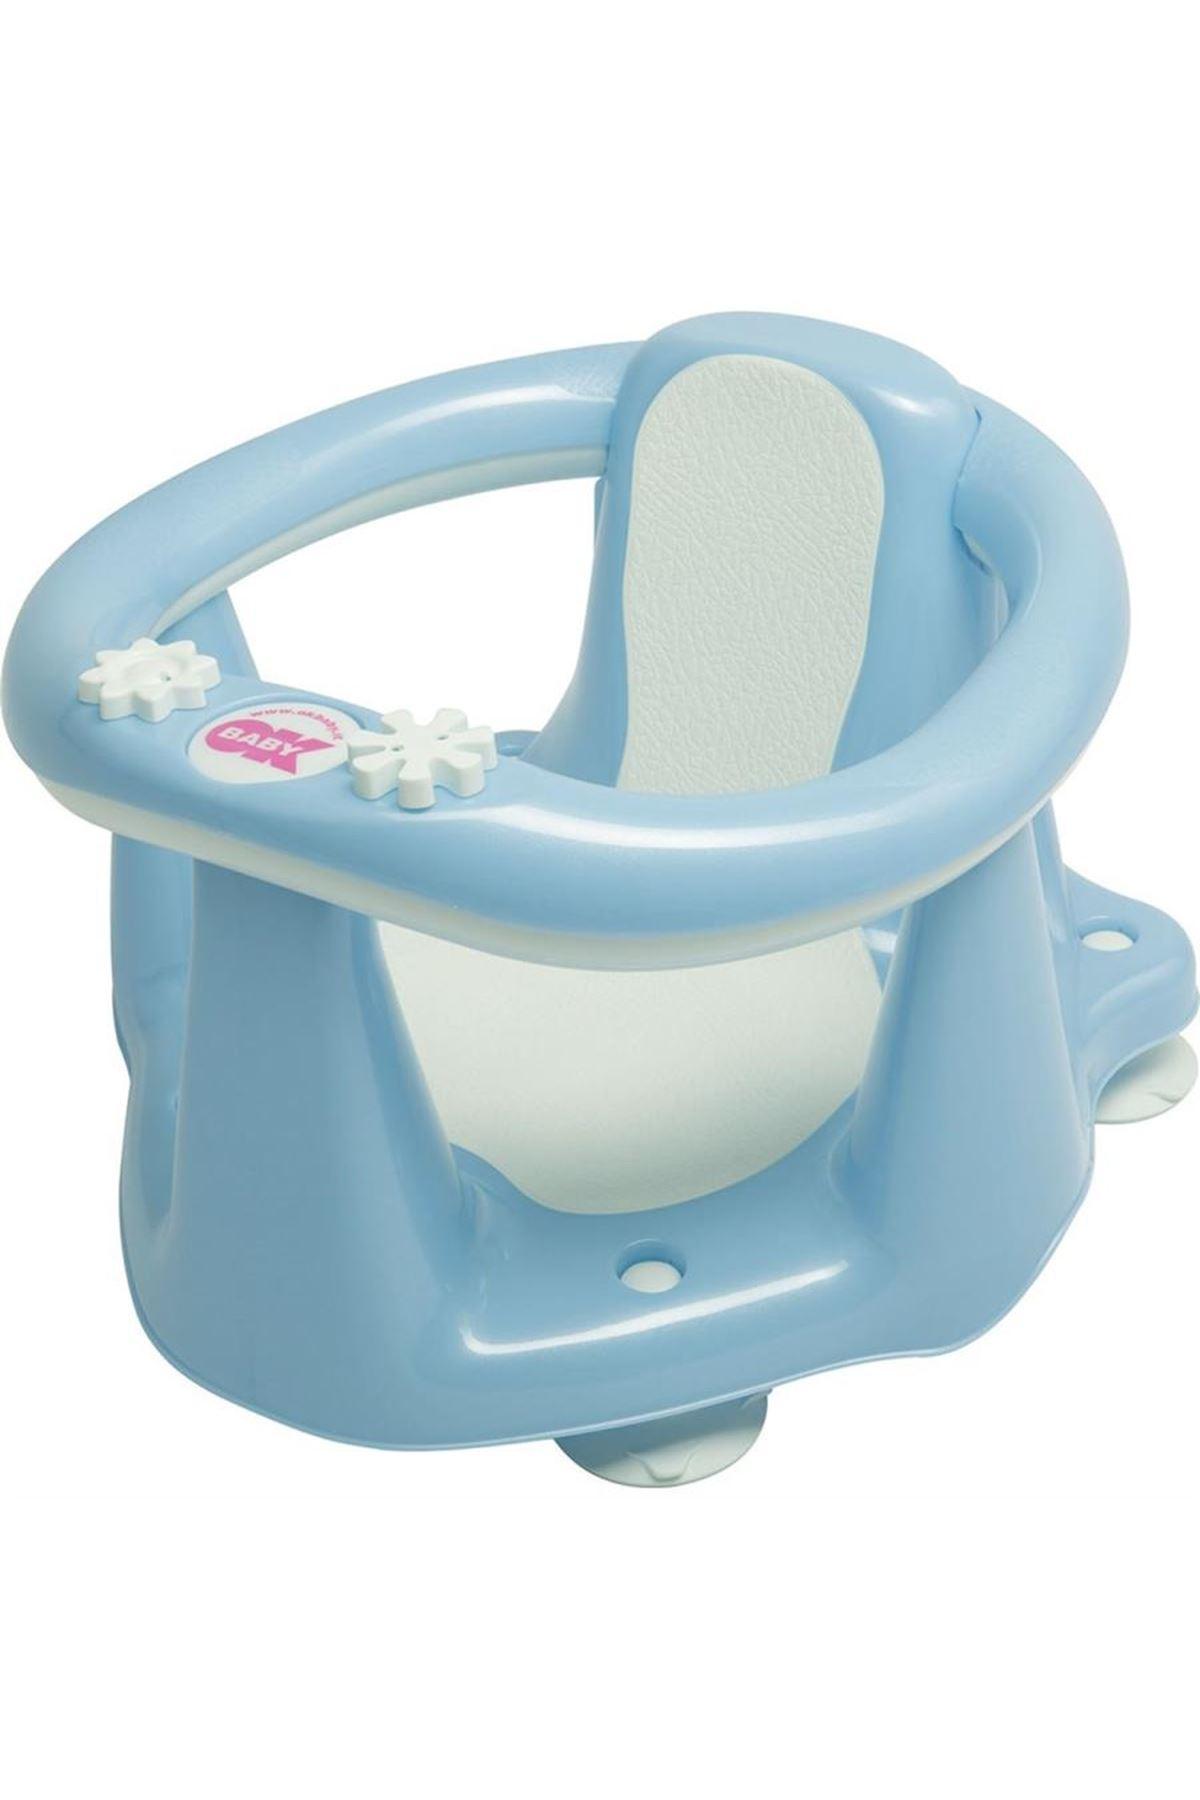 Okbaby Flipper Evol Banyo Oturağı / Mavi